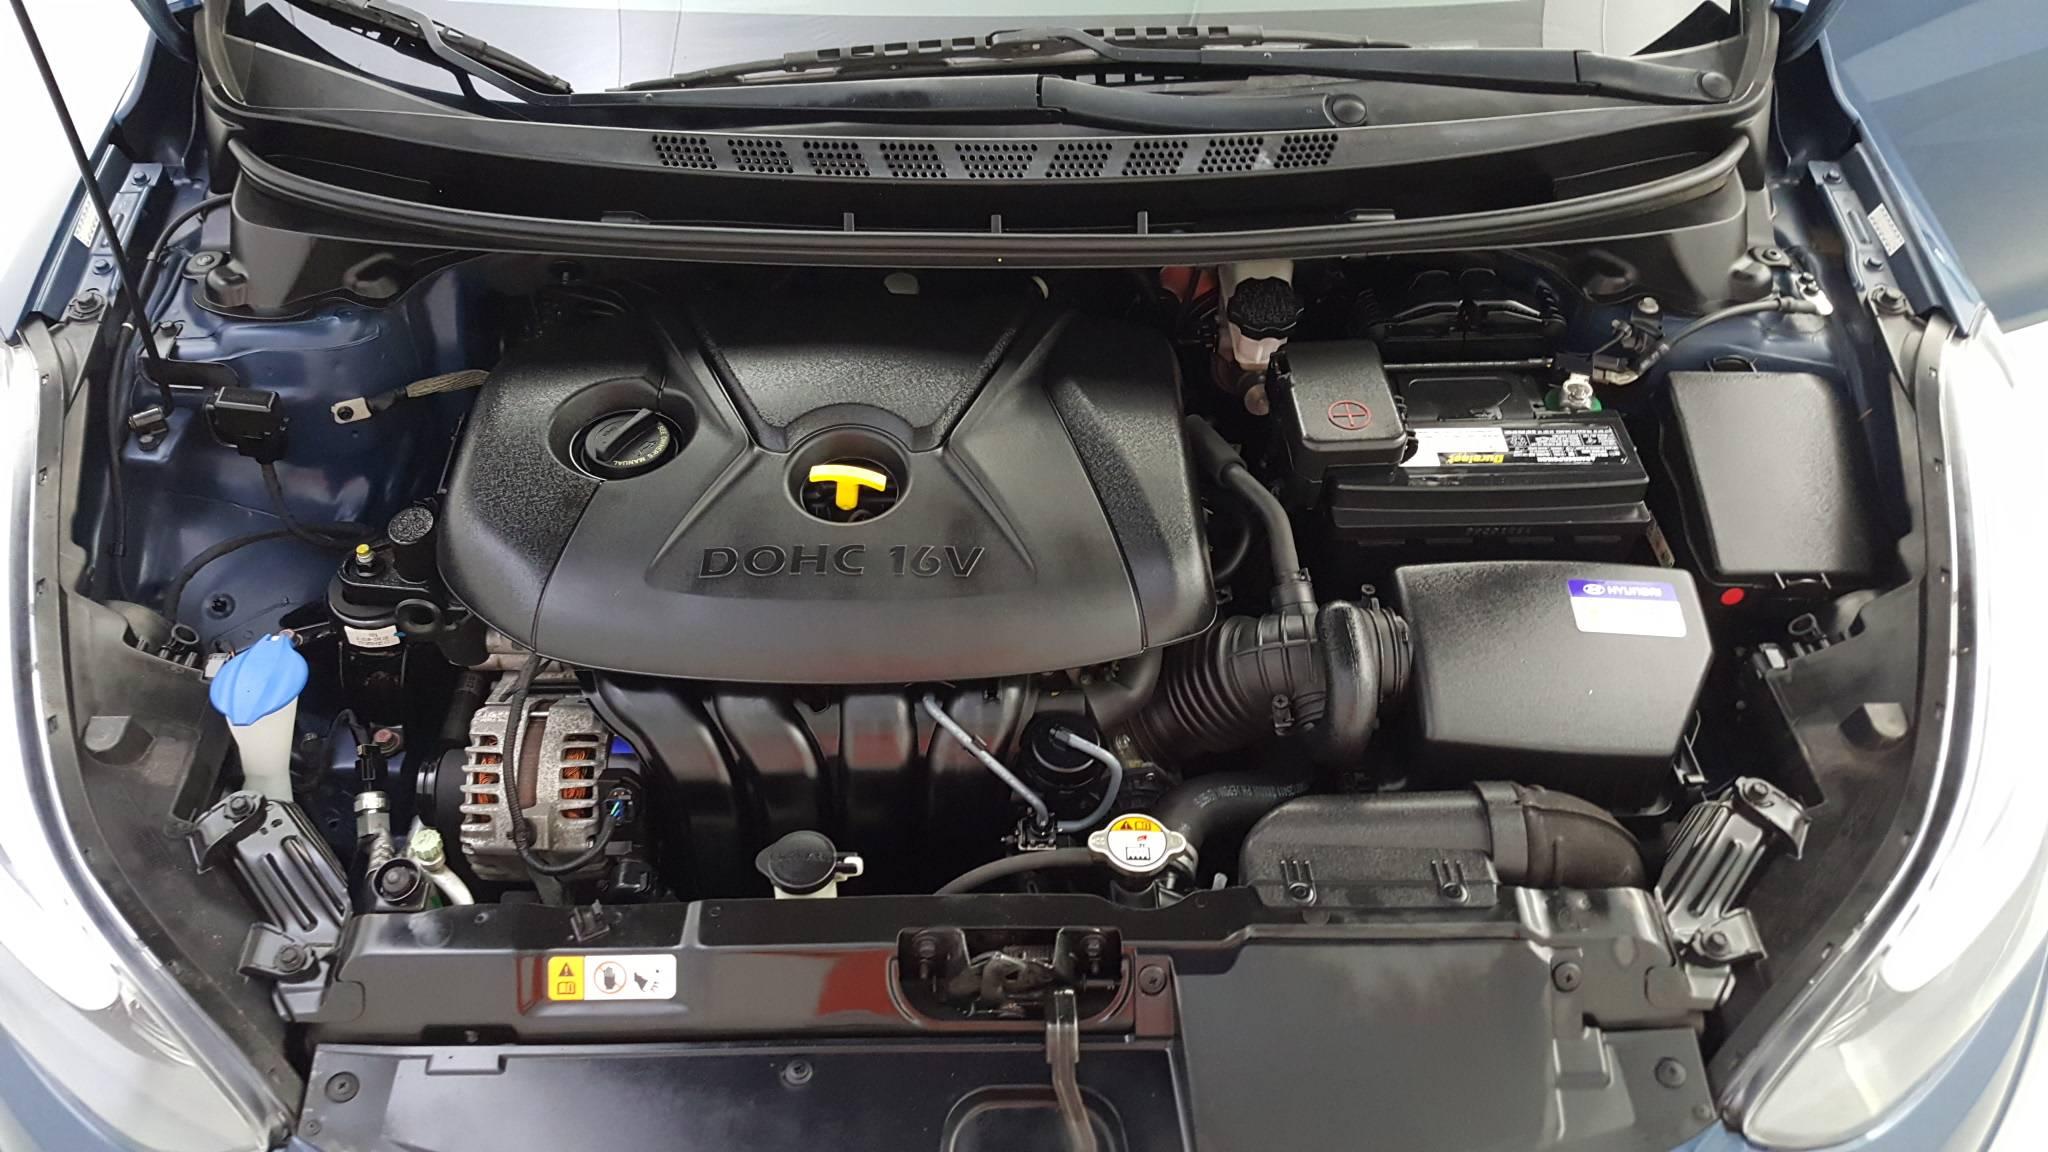 Pre-Owned 2016 Hyundai Elantra Value Edition